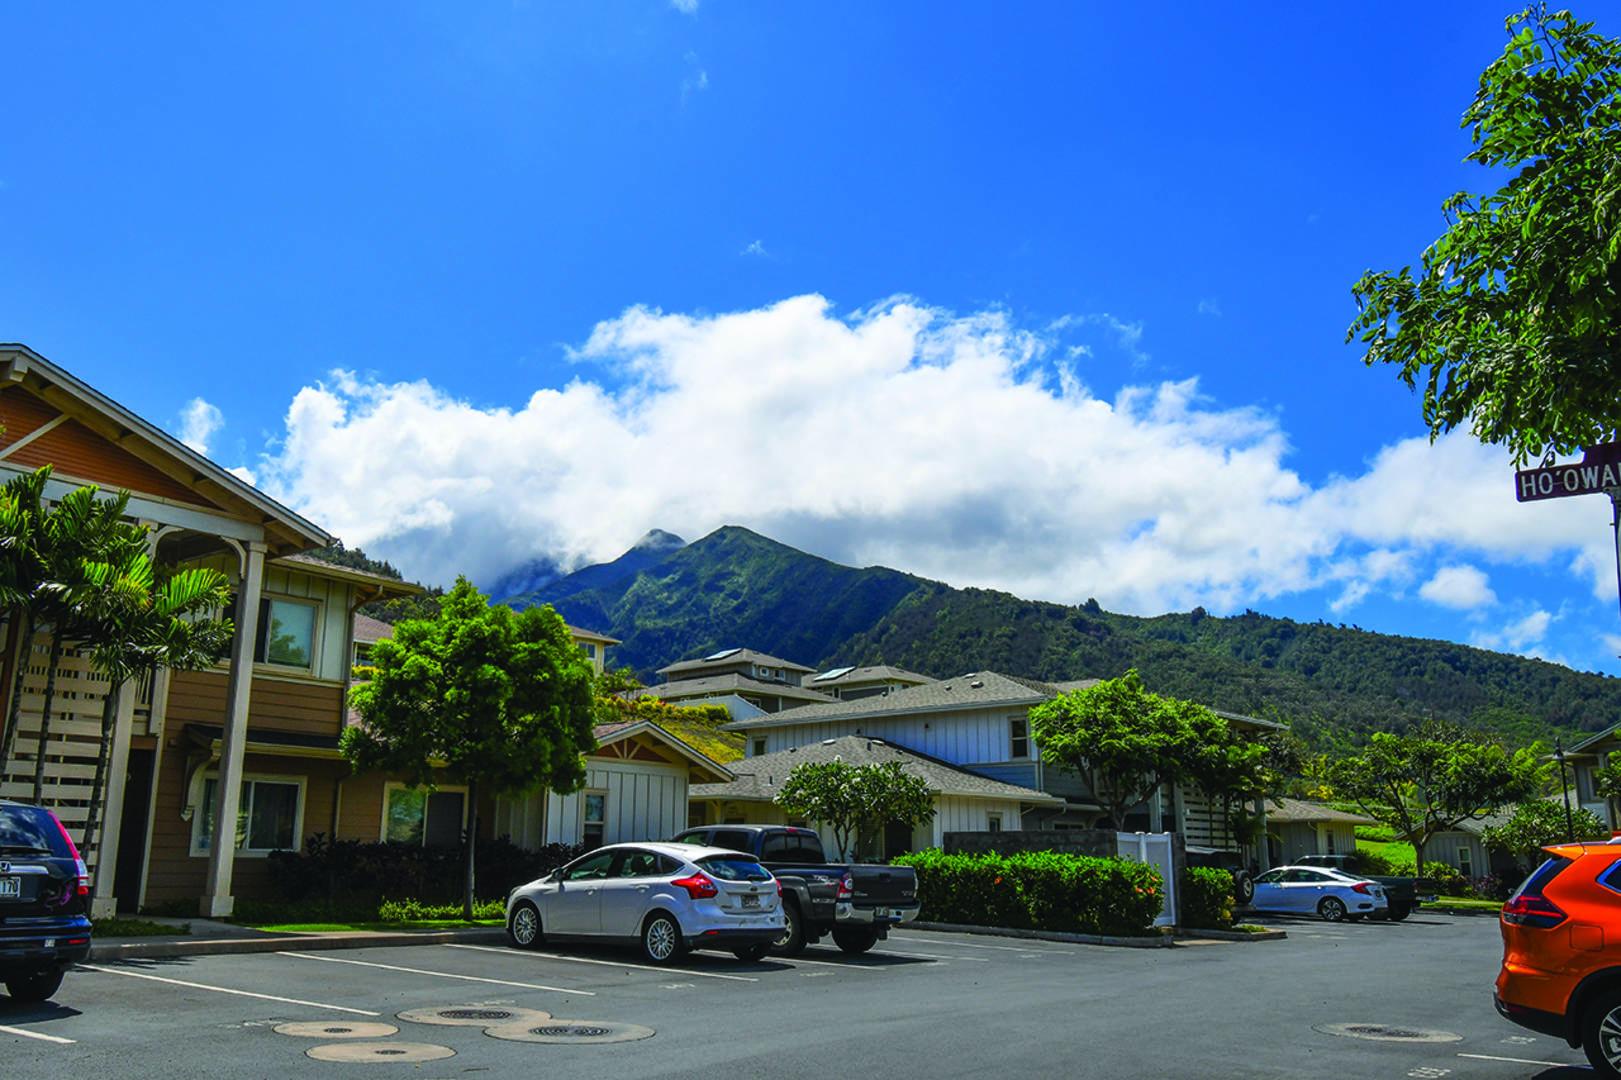 125 Hoowaiwai Unit 1902 Wailuku, HI 96793